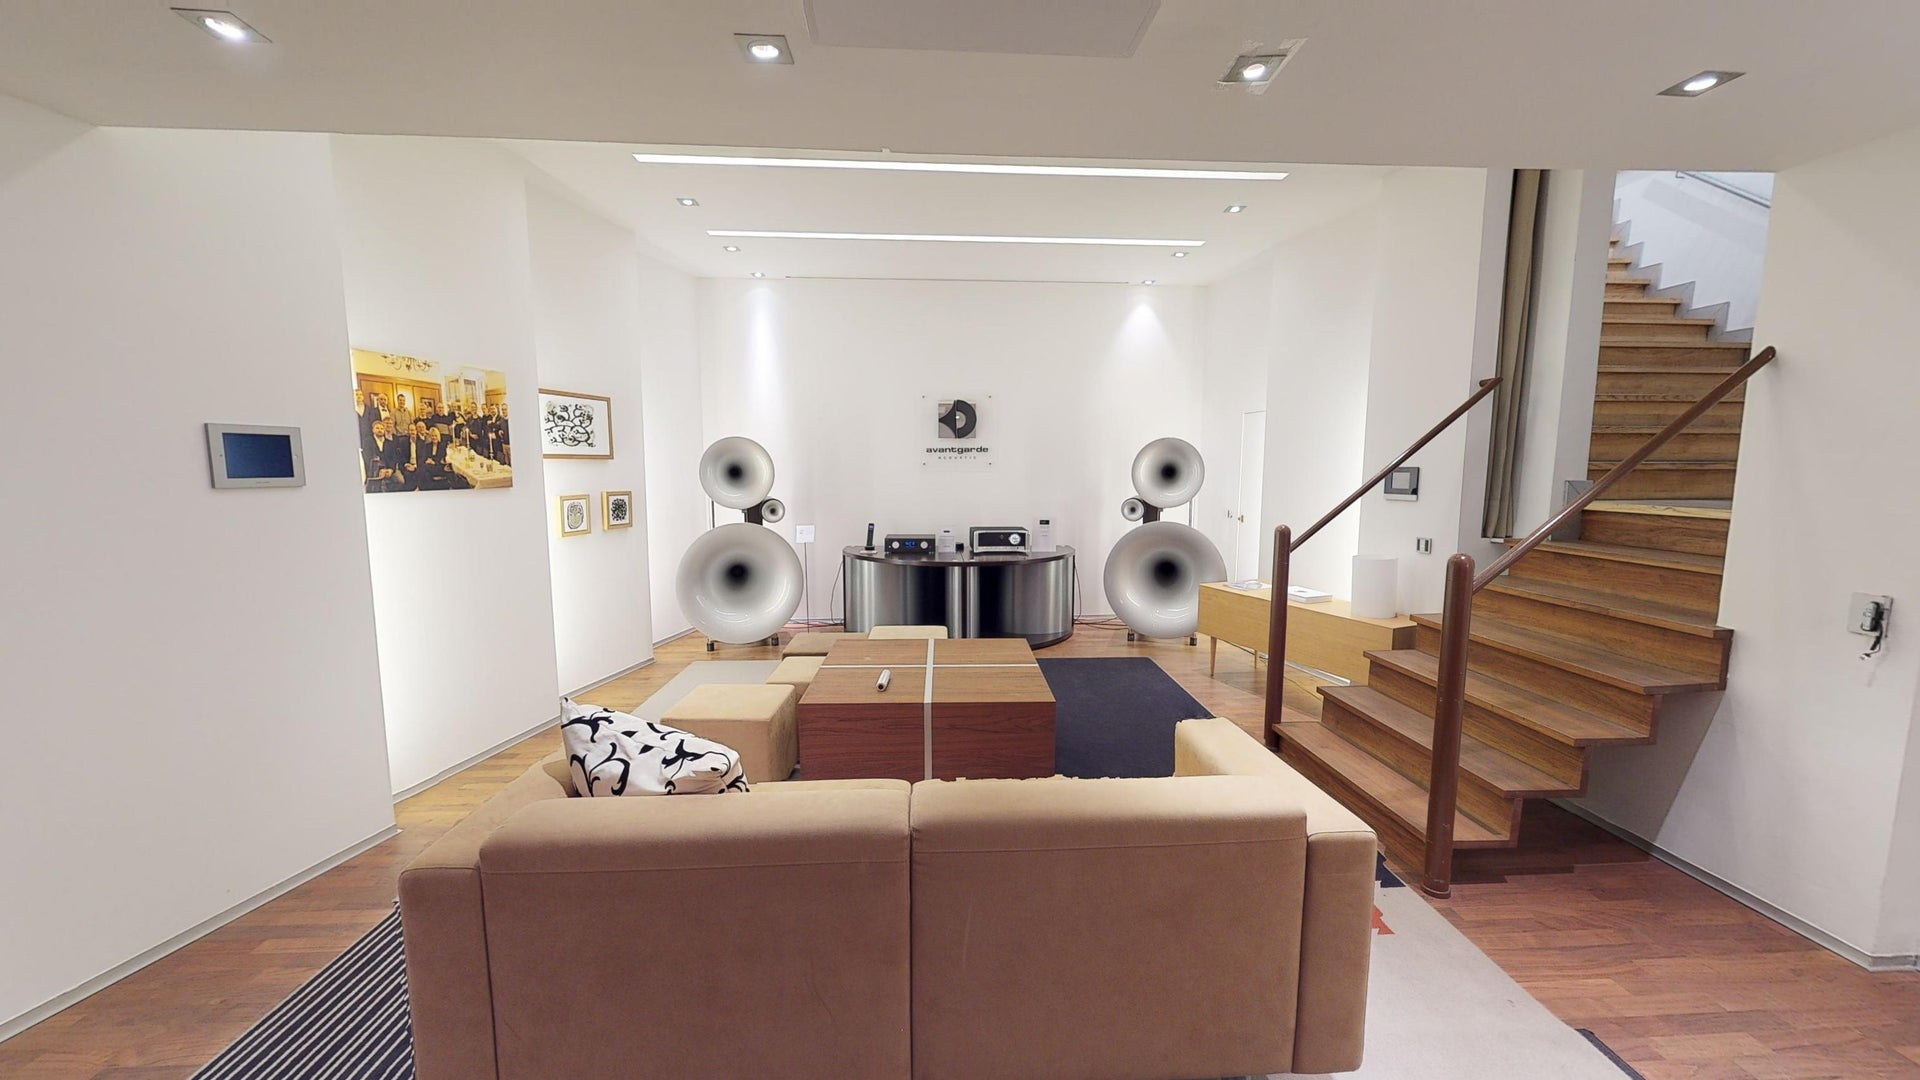 Explore Reisenberger Galerie in 3D